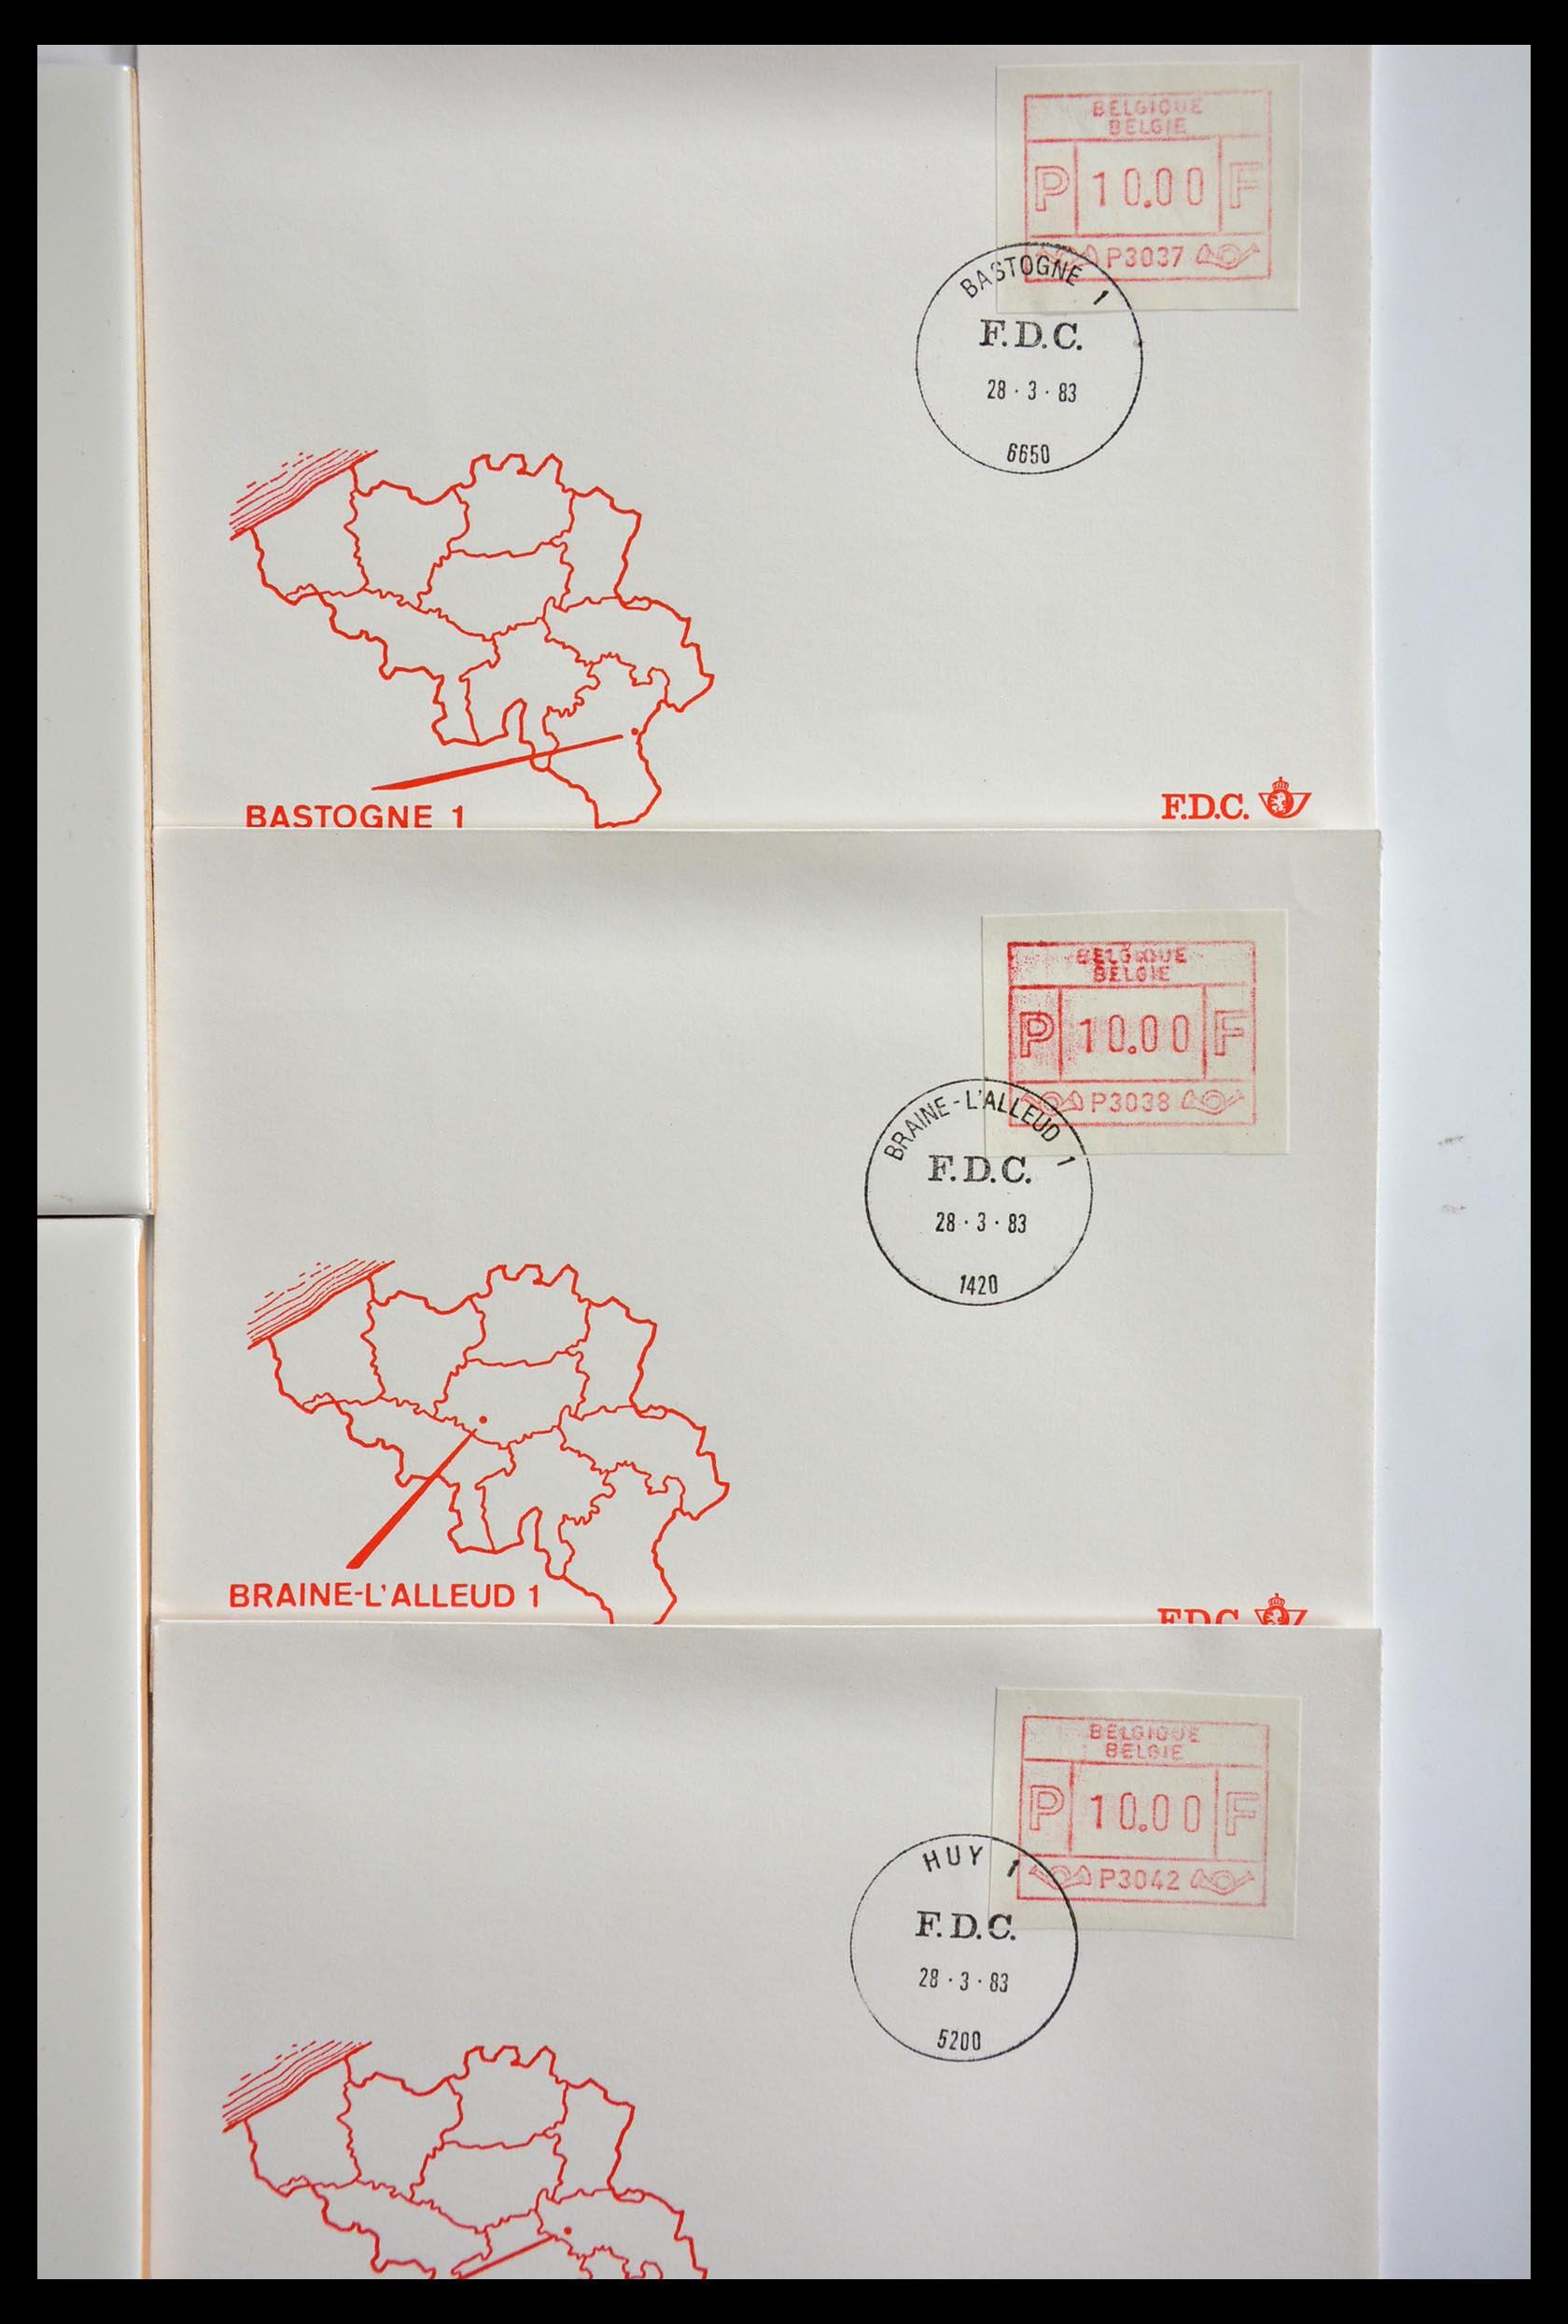 29353 011 - 29353 West Europa automaatzegels.